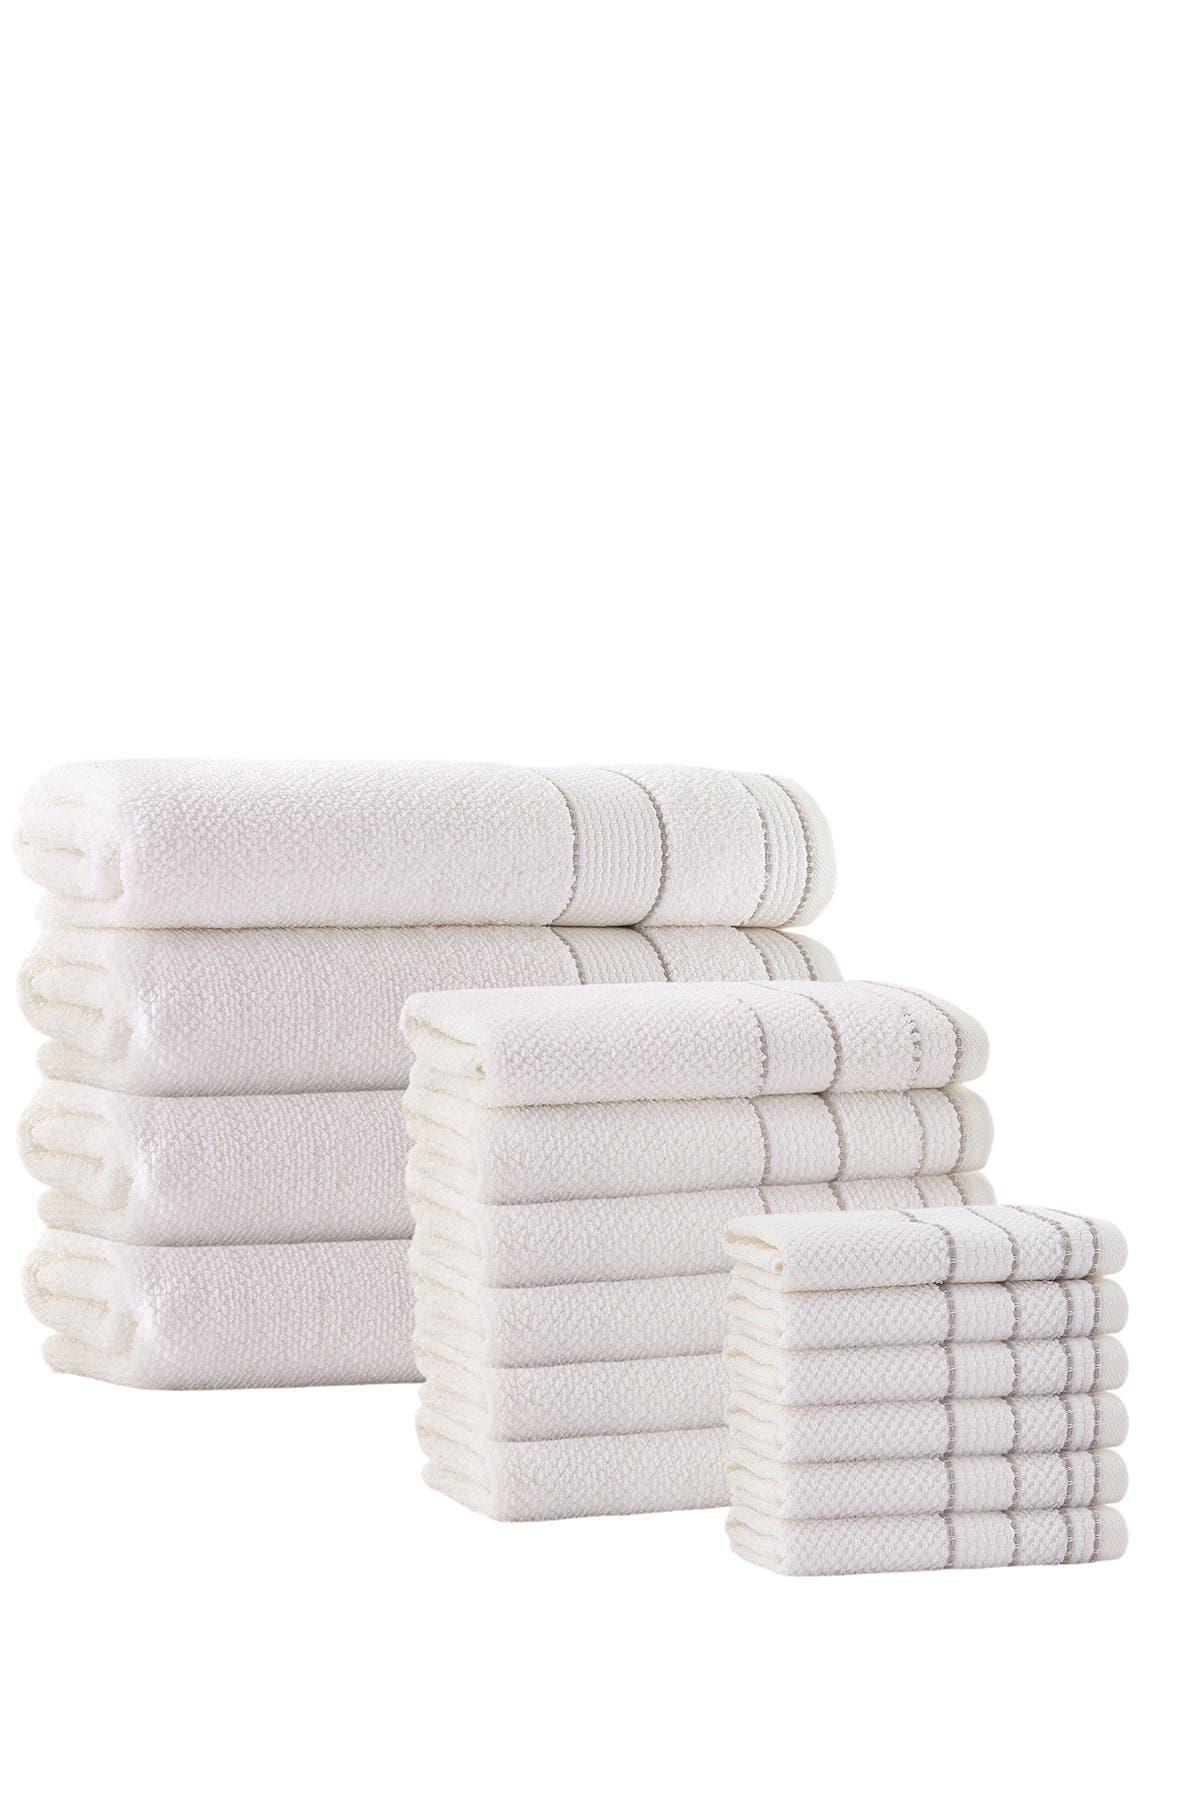 Image of ENCHANTE HOME Monroe Turkish Cotton 16-Piece Towel Set - Cream